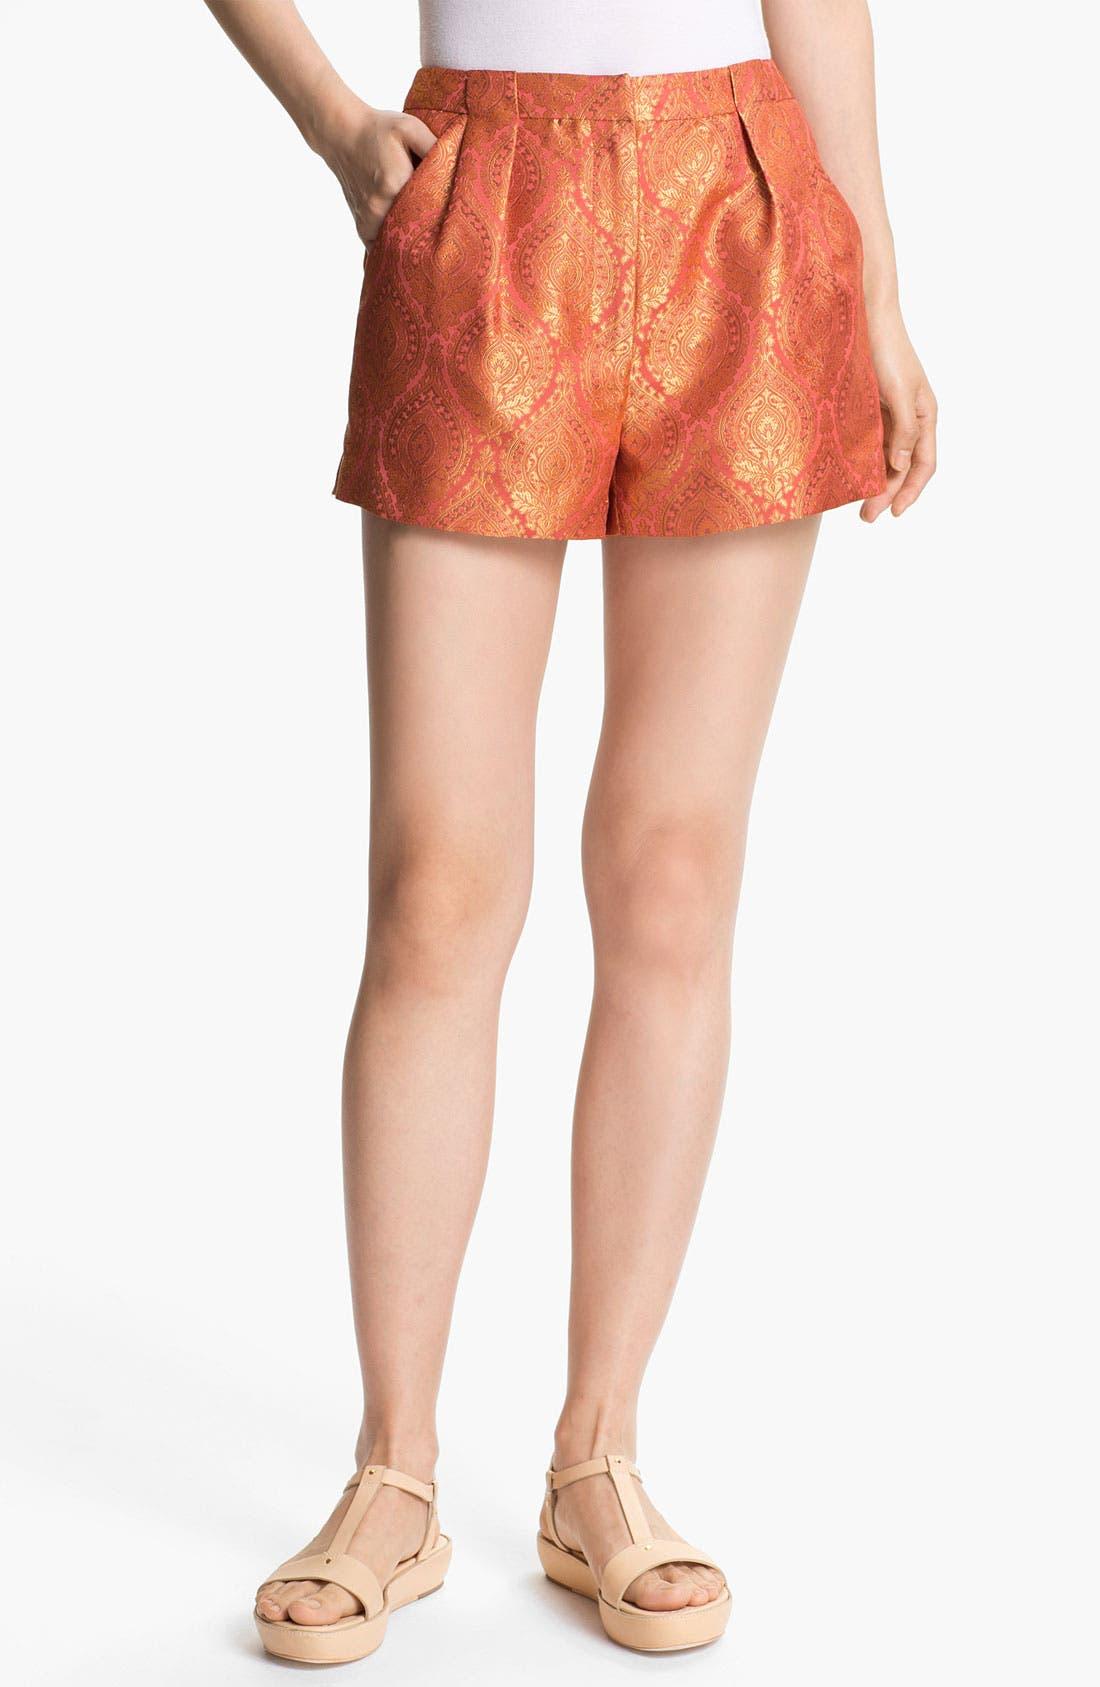 Alternate Image 1 Selected - Elizabeth and James 'Stevie' Metallic Jacquard Shorts